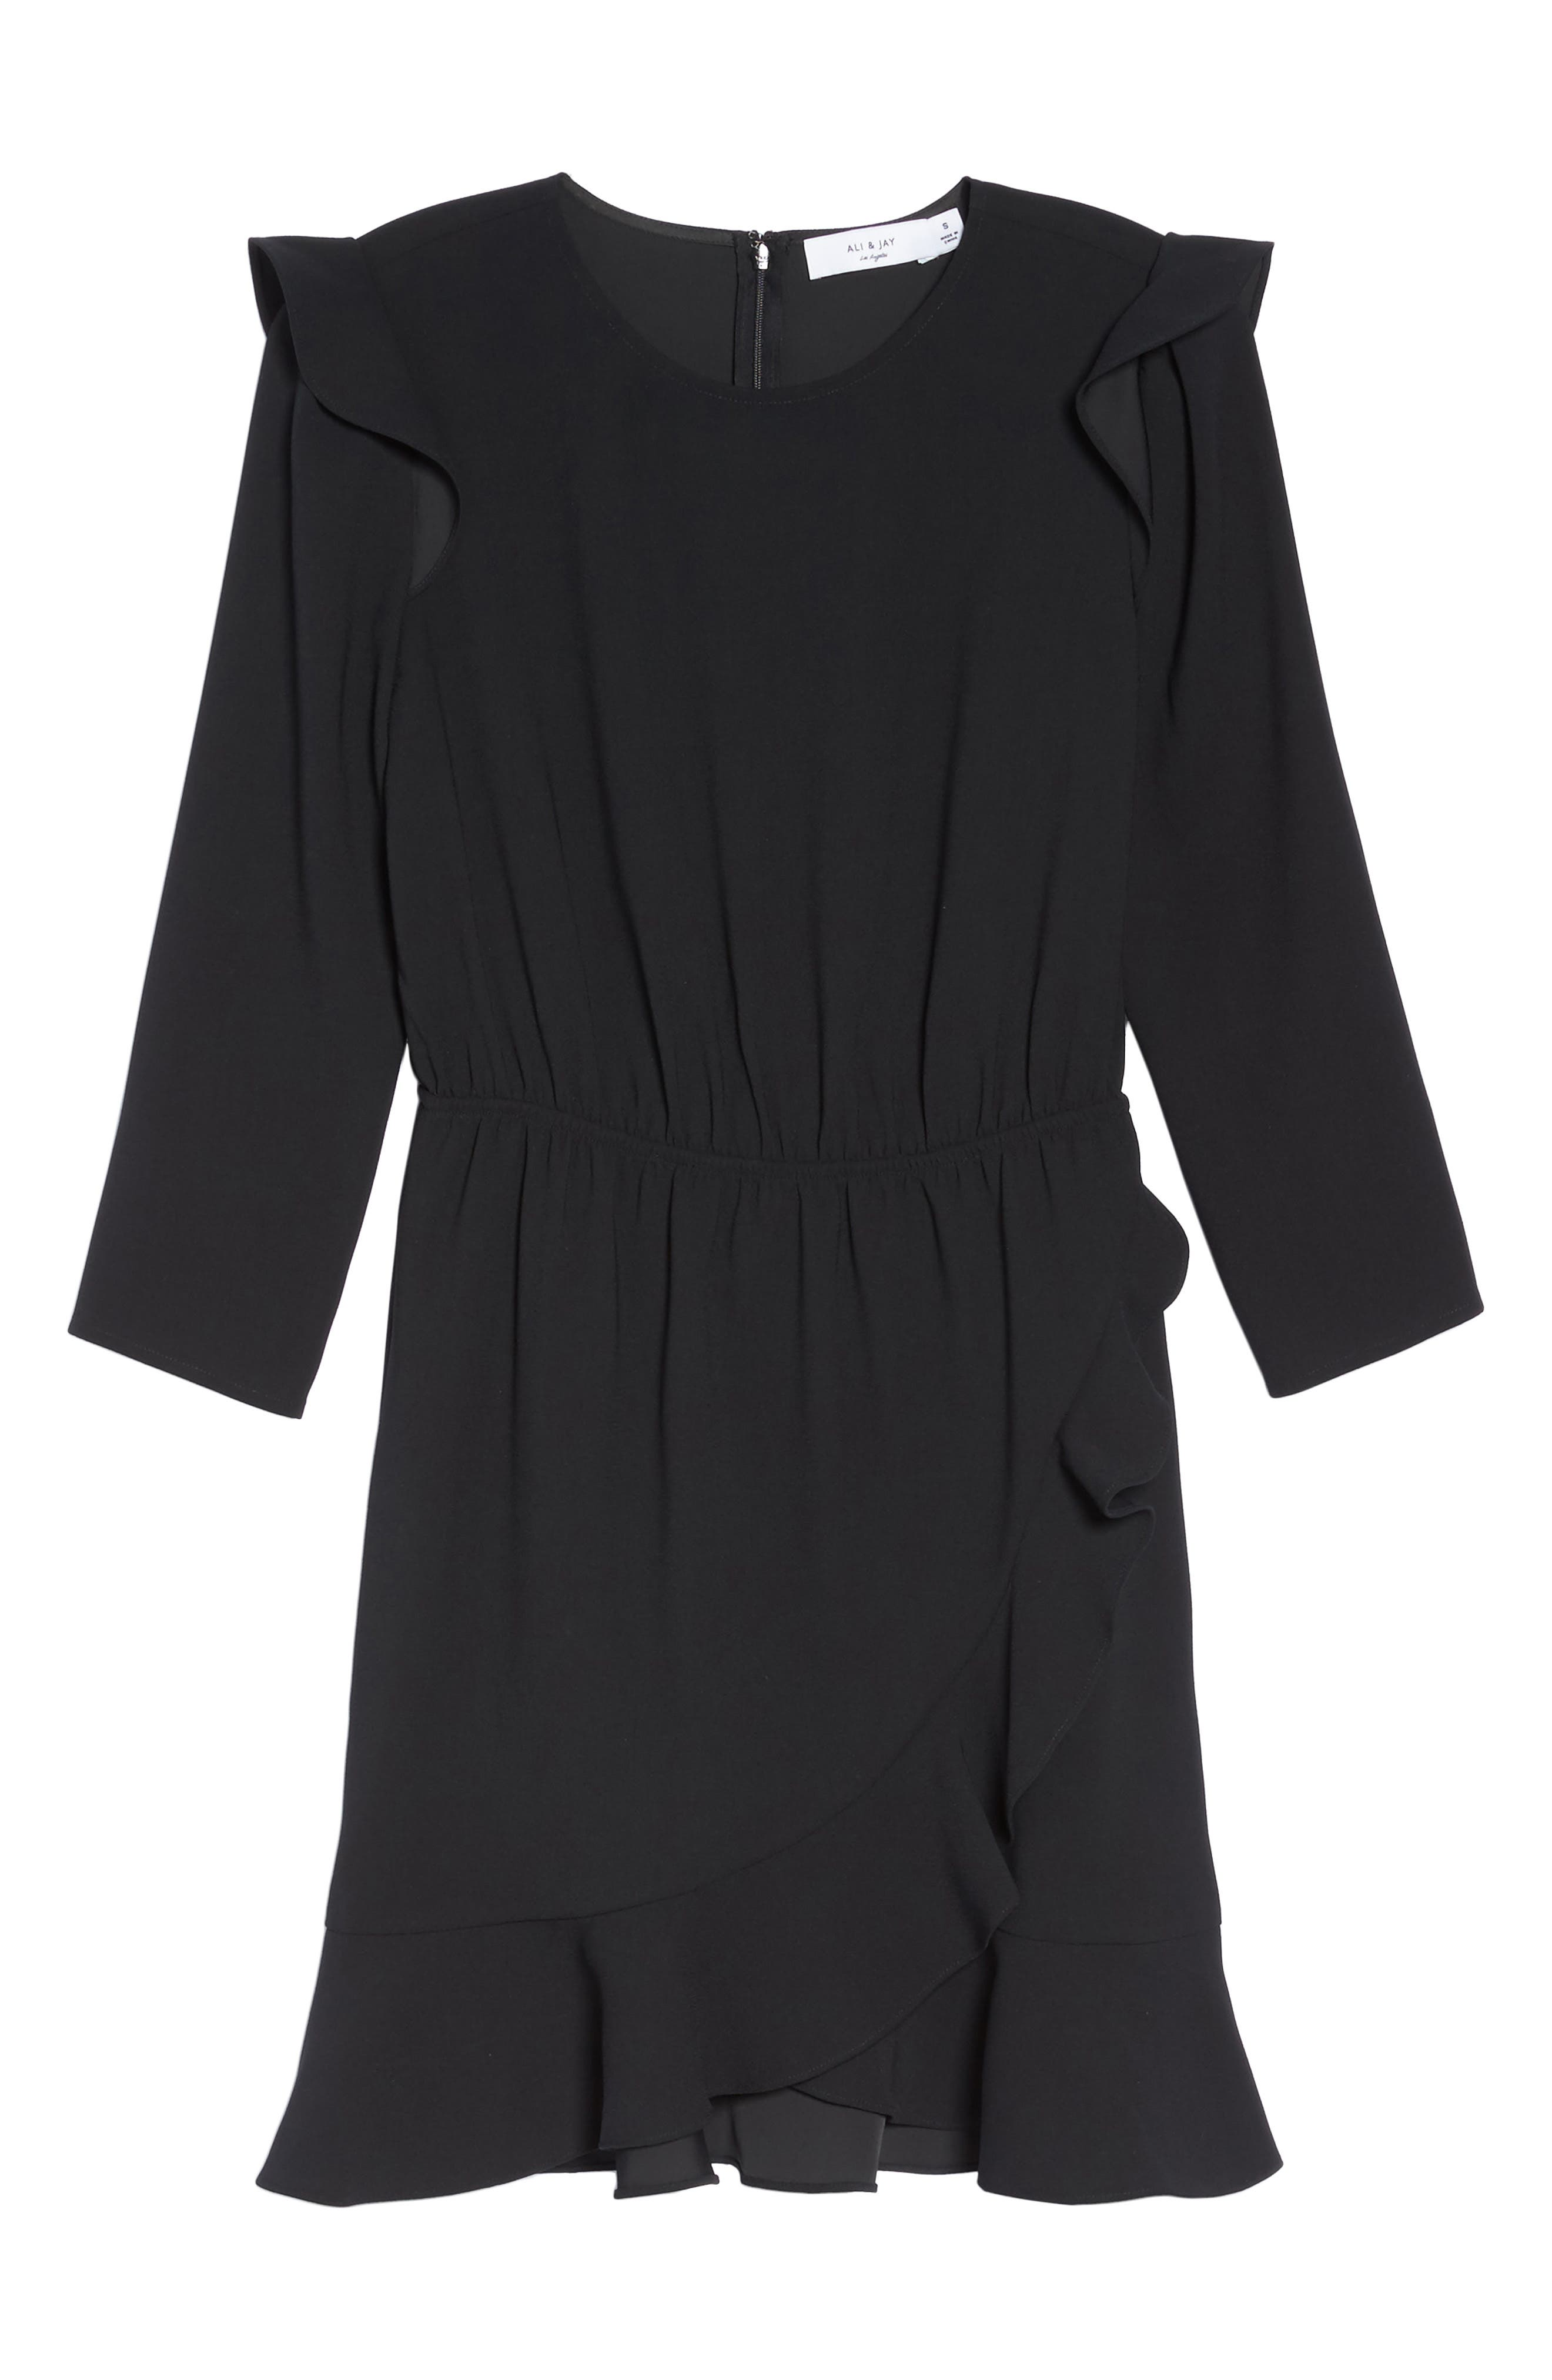 St Germain Ruffle Fit & Flare Dress,                             Alternate thumbnail 11, color,